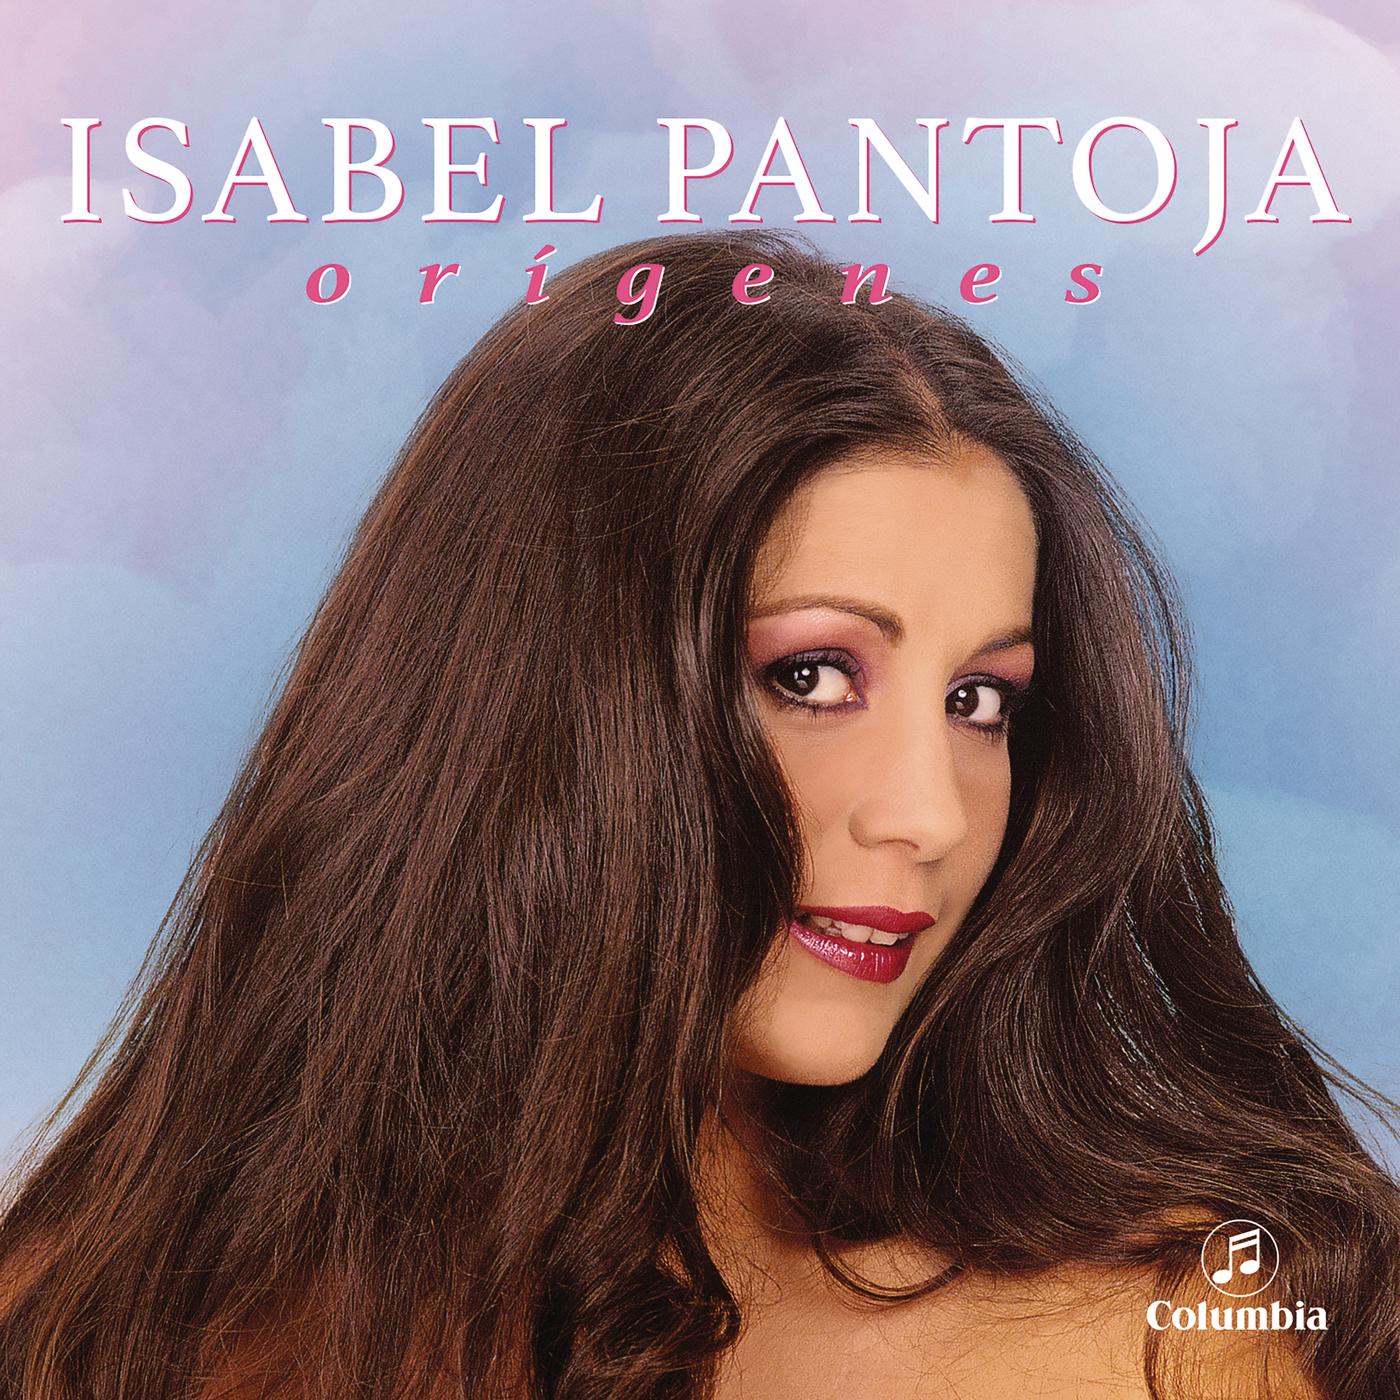 Orígenes - Isabel Pantoja